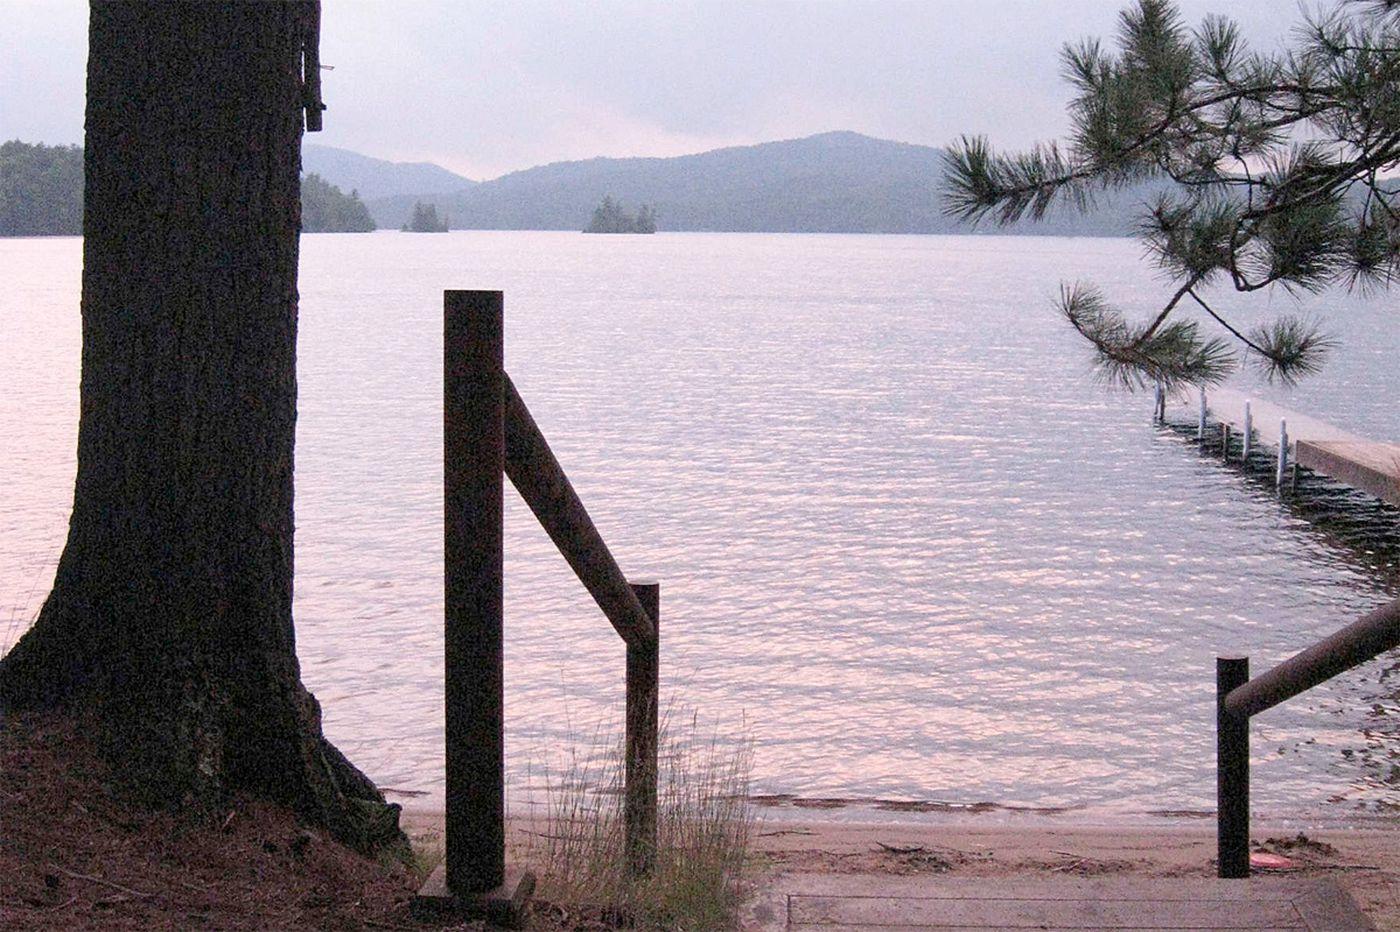 Personal journey: On 'Wild' Saranac Lake